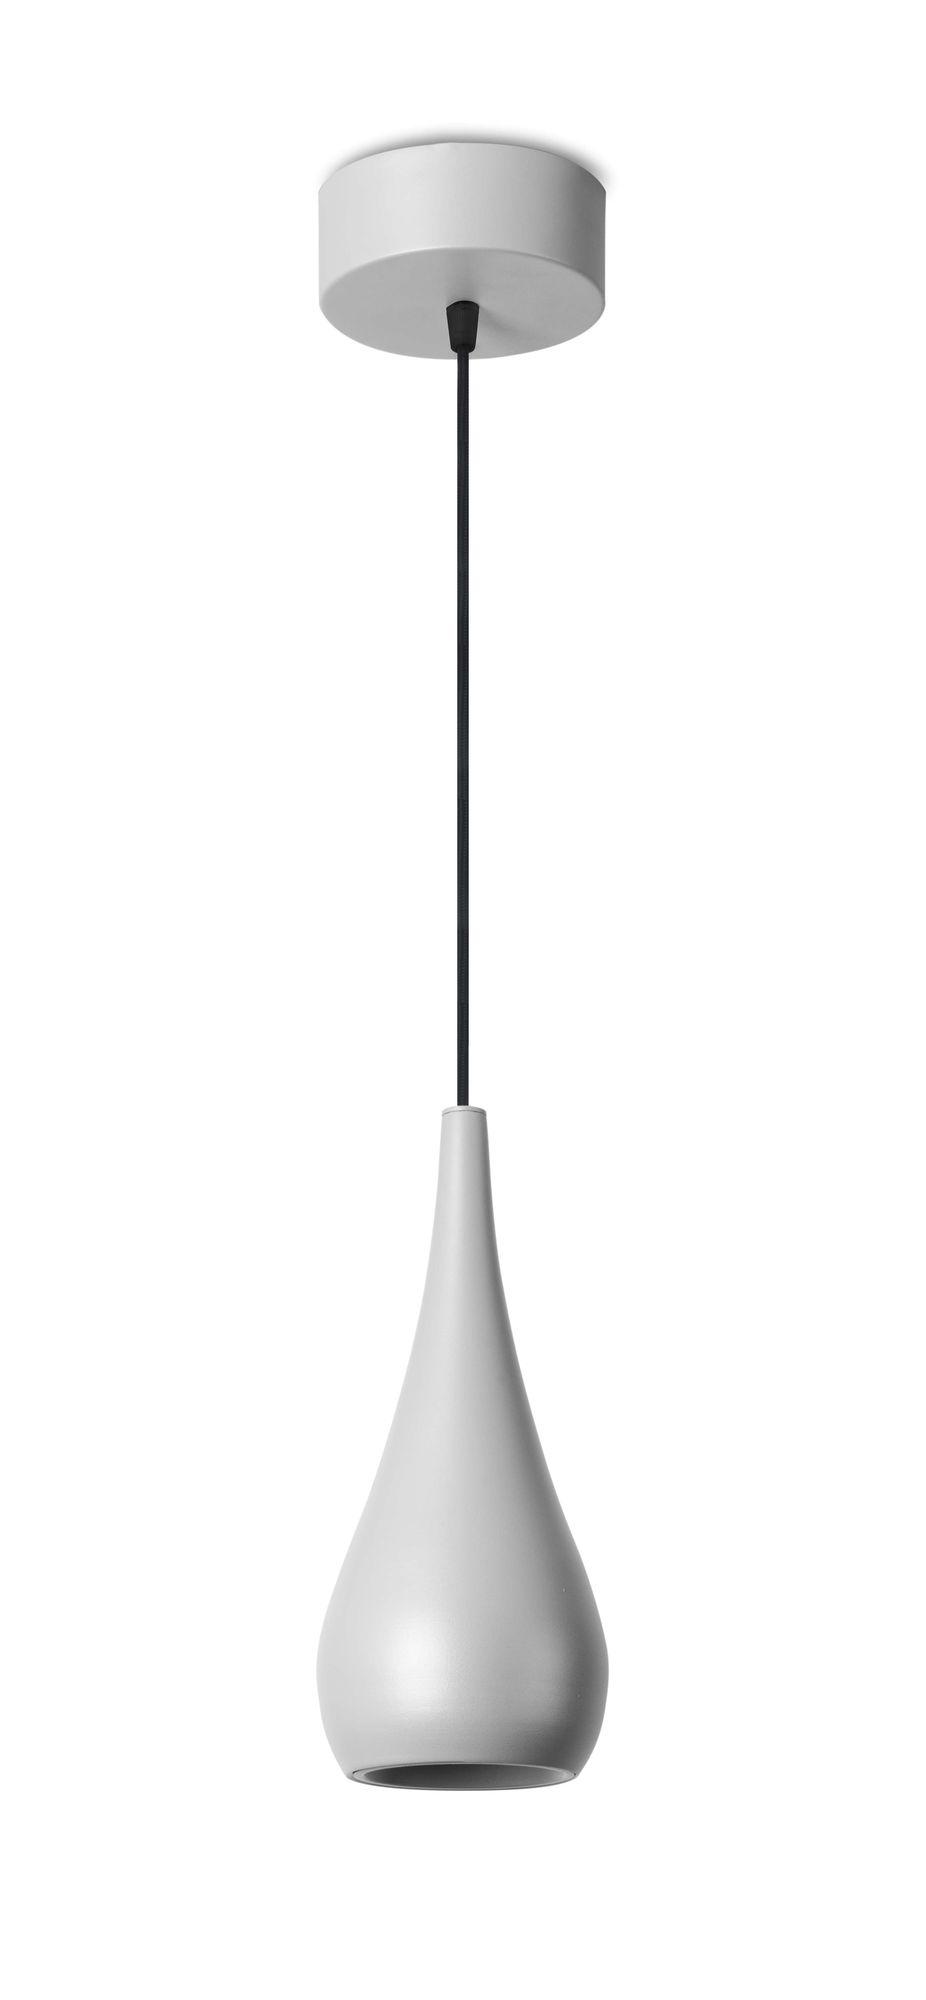 LaCreu 00-5350-34-34 LED lampen